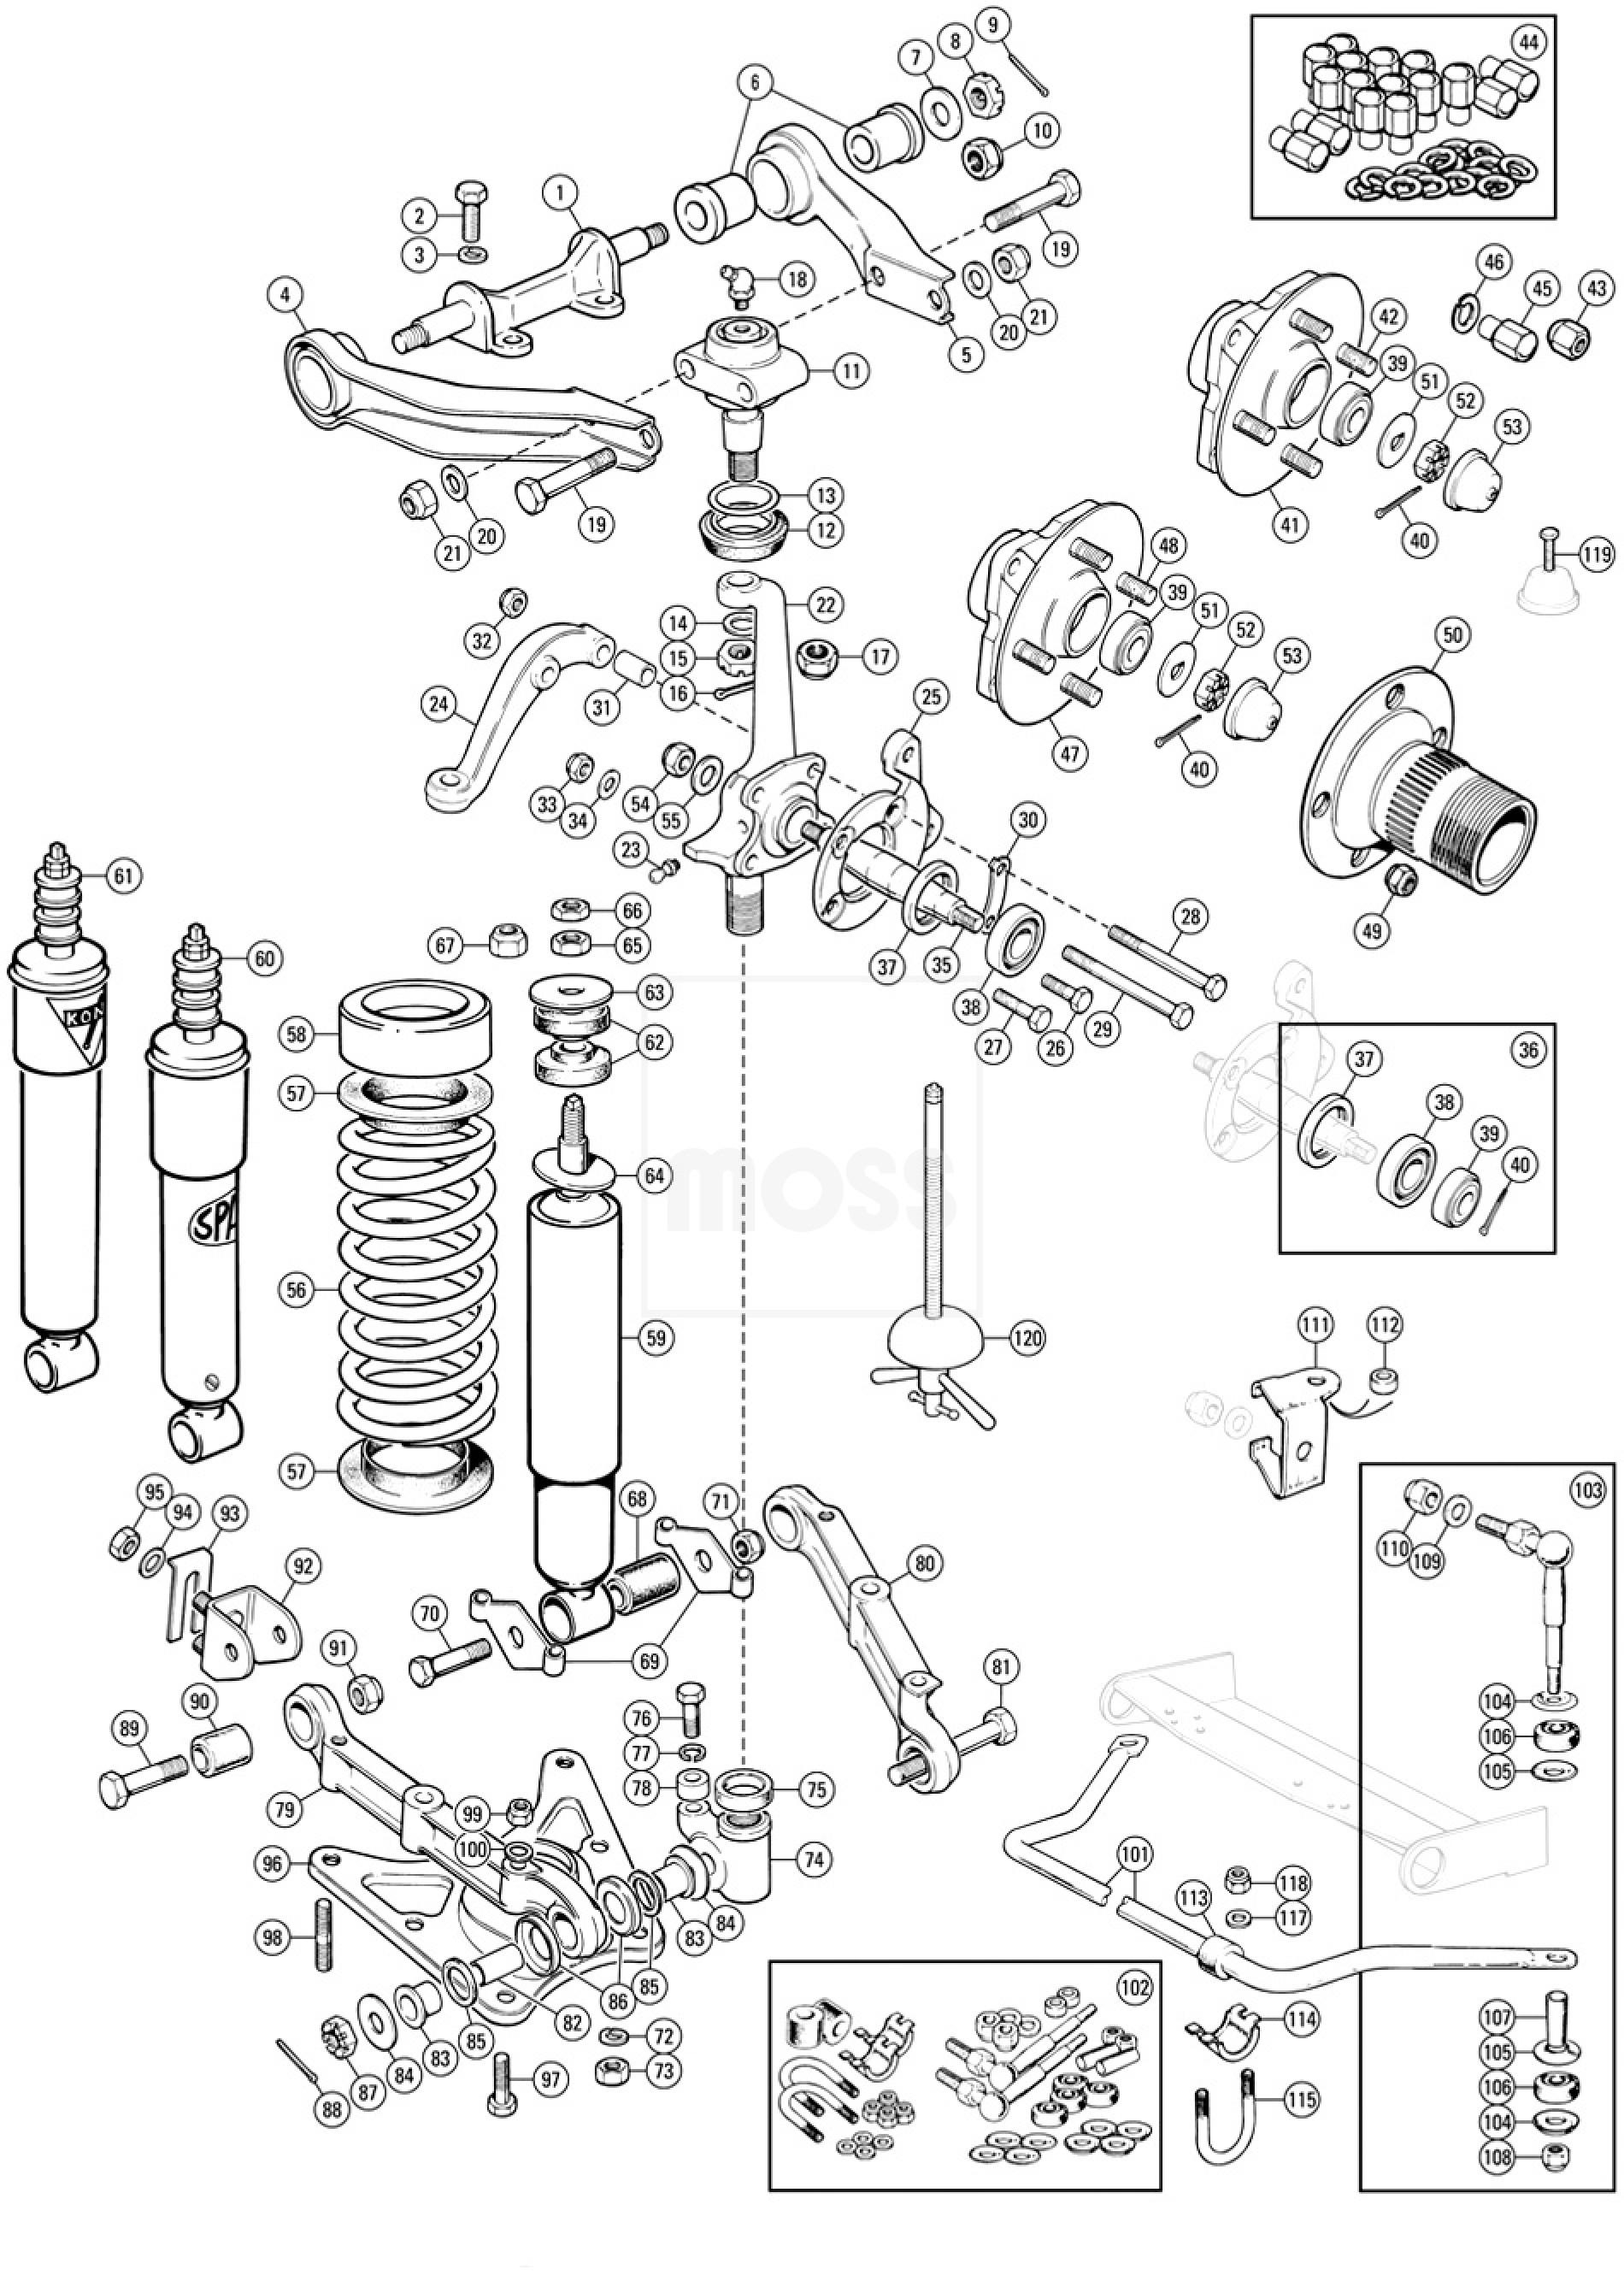 02 jaguar x type fuse box diagram